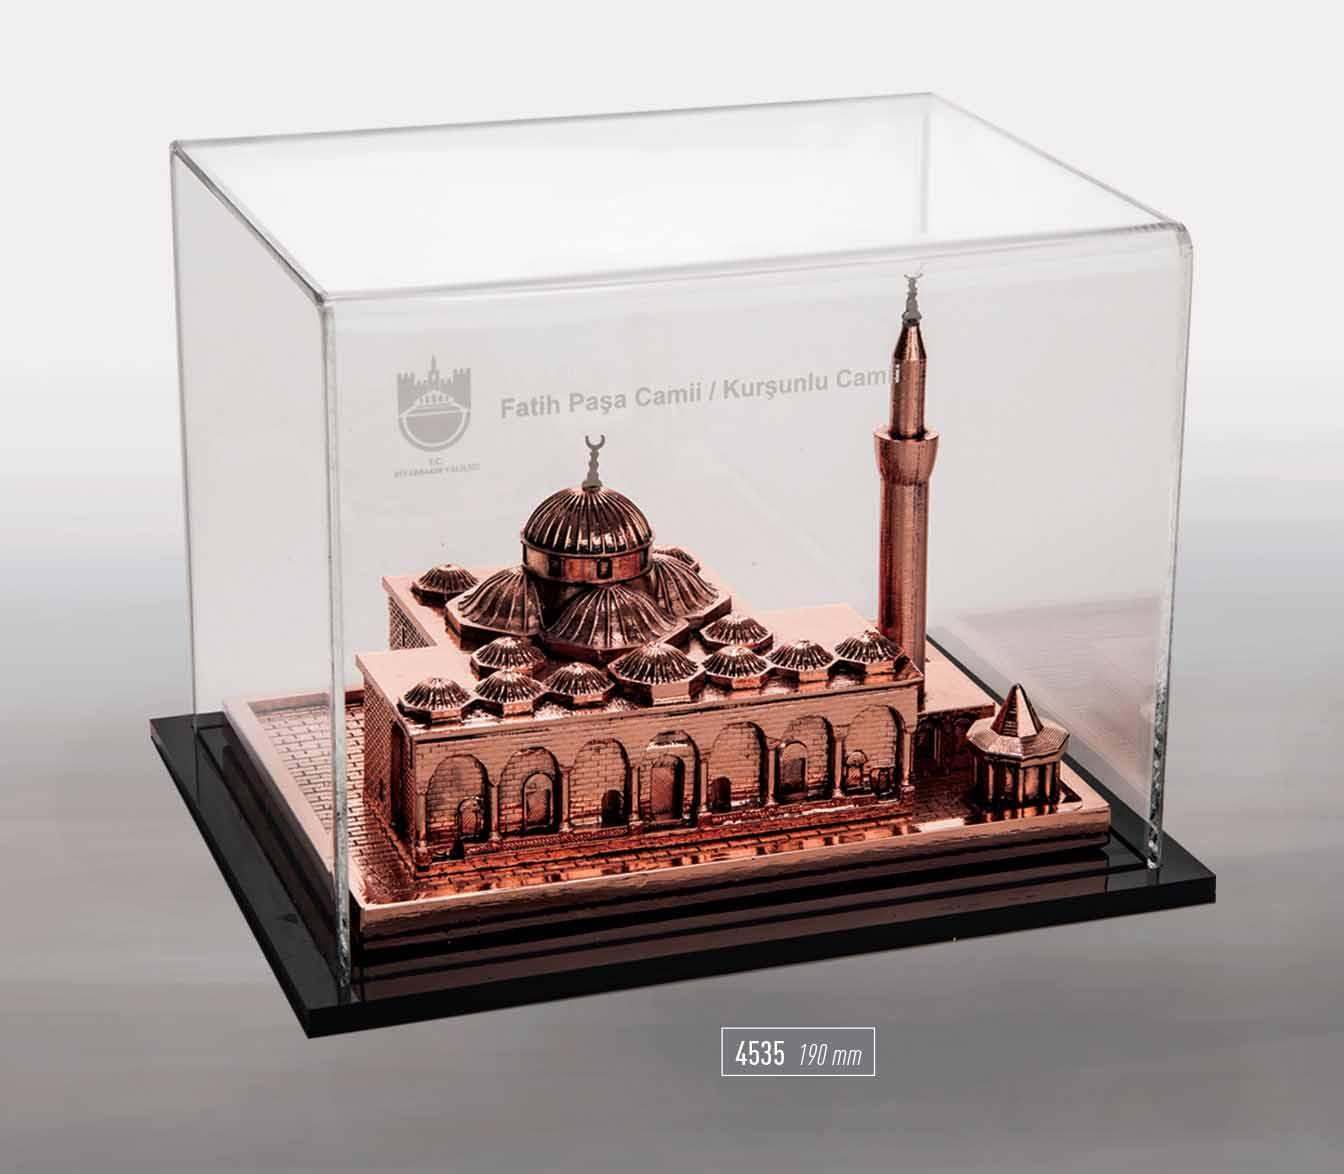 4535 - 3D Object